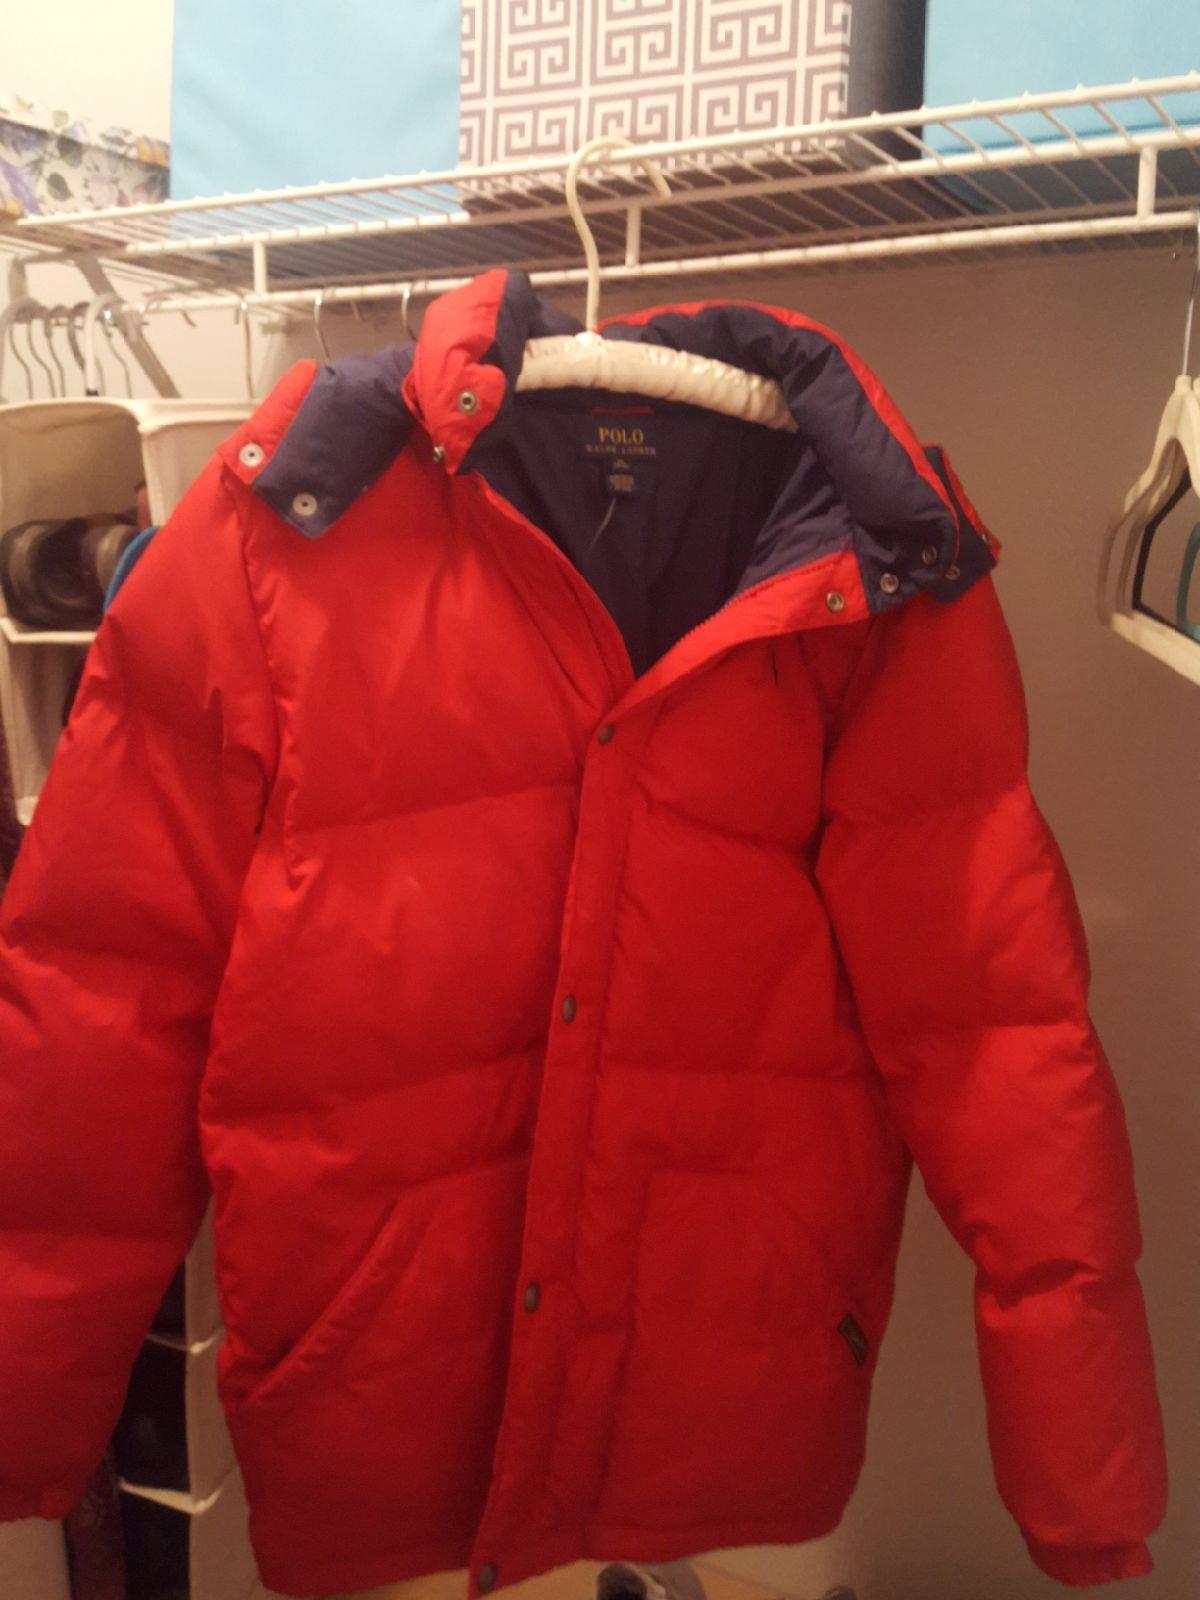 womens winter coat Polo by Ralph Lauren